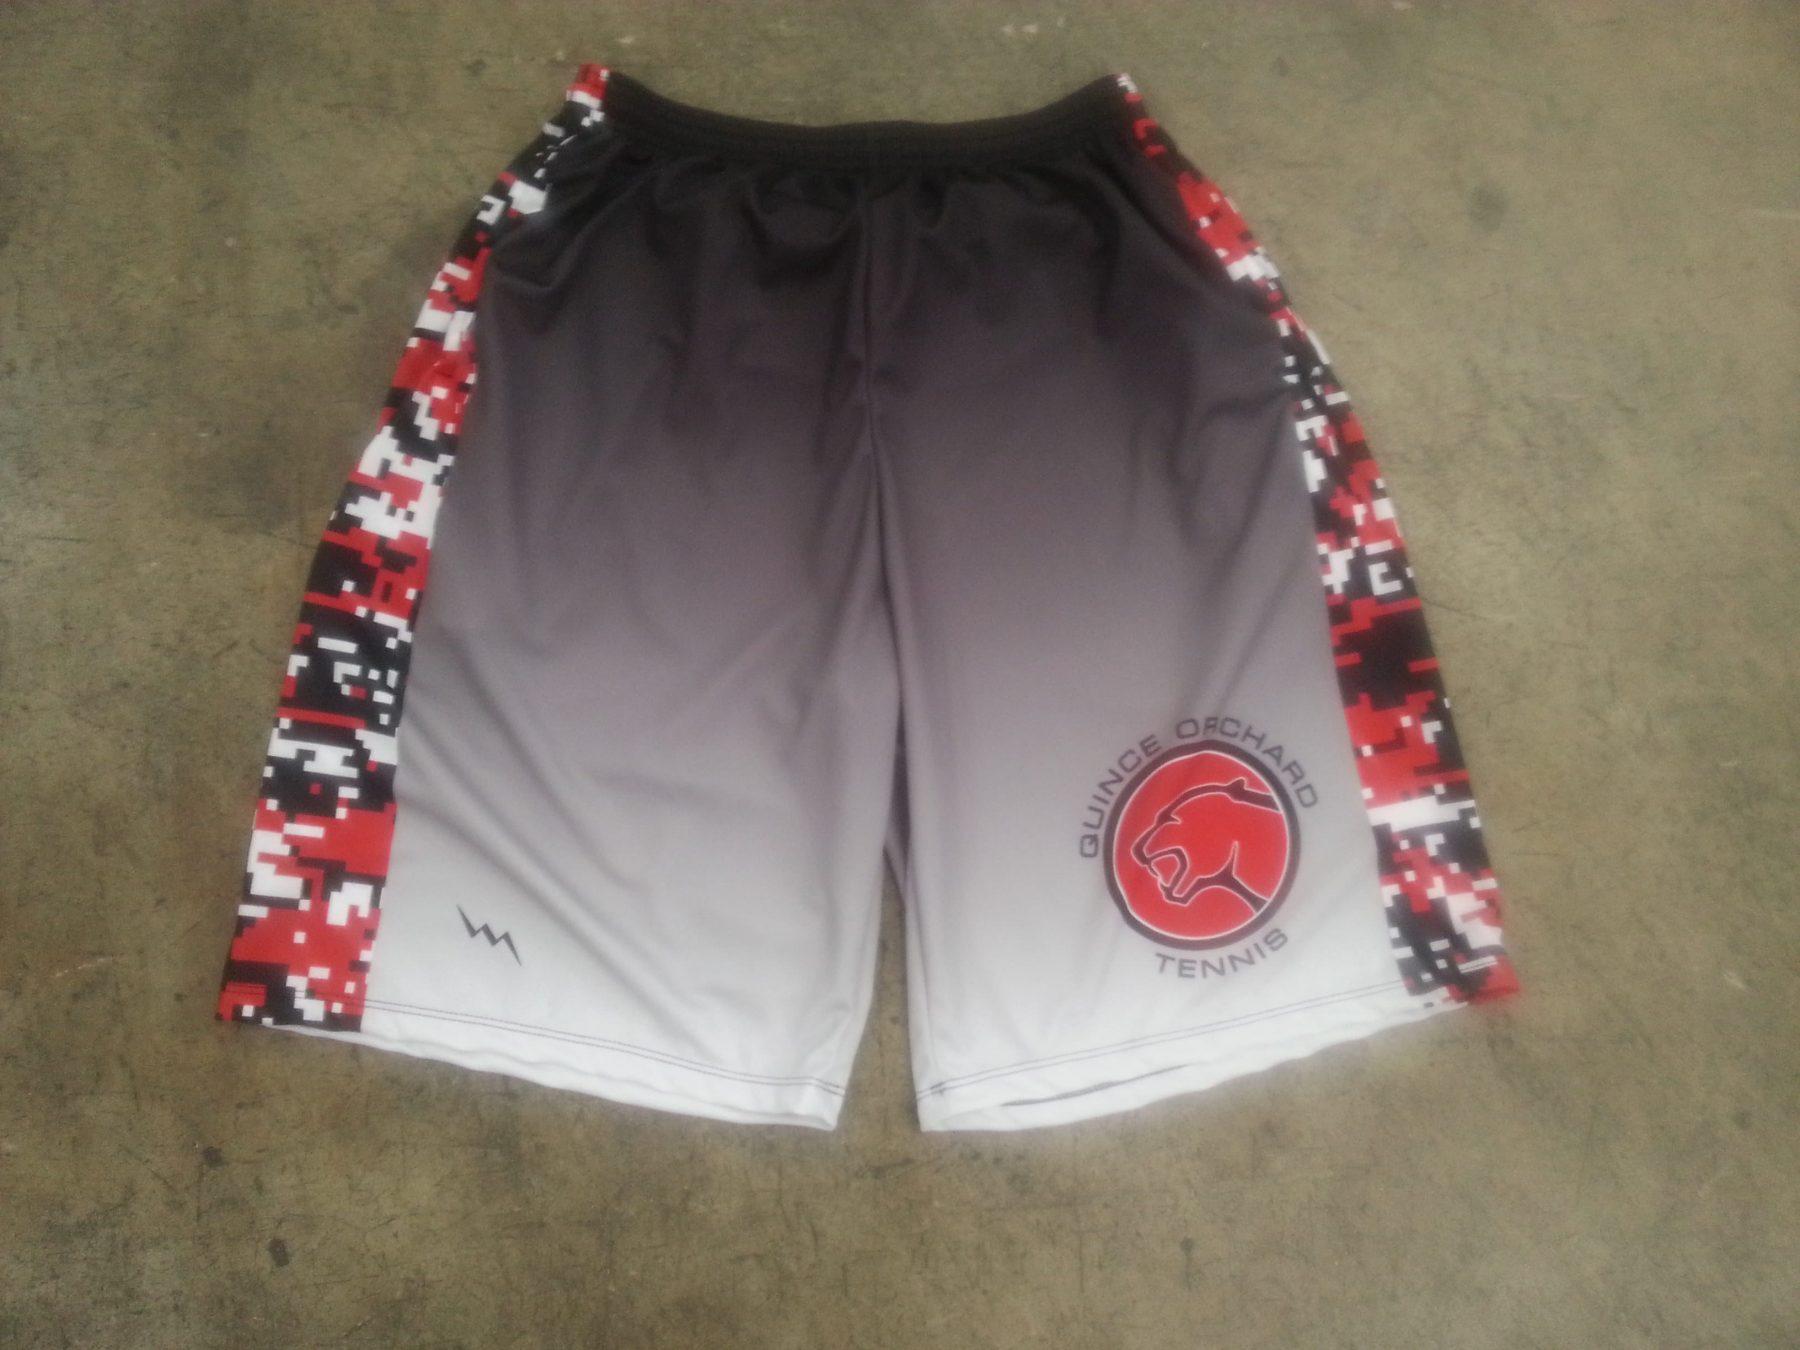 sublimated tennis shorts